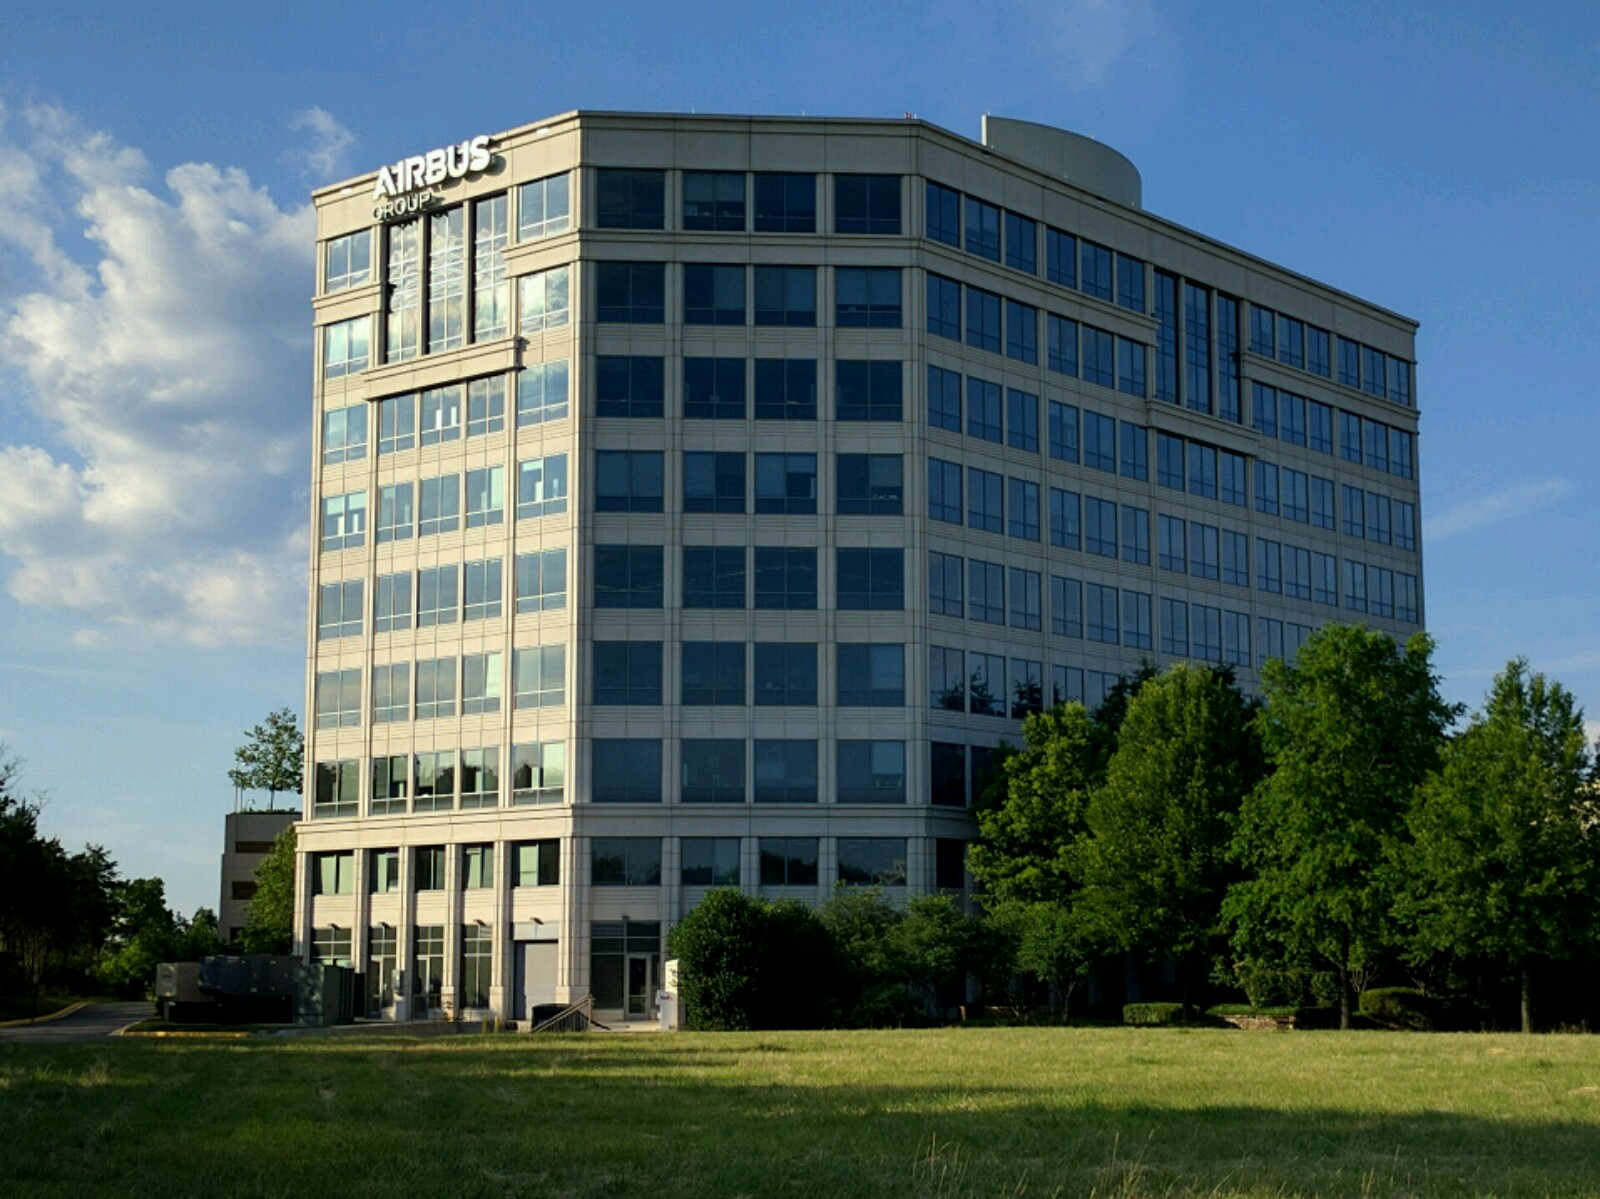 Airbus office in Herndon, Virginia.